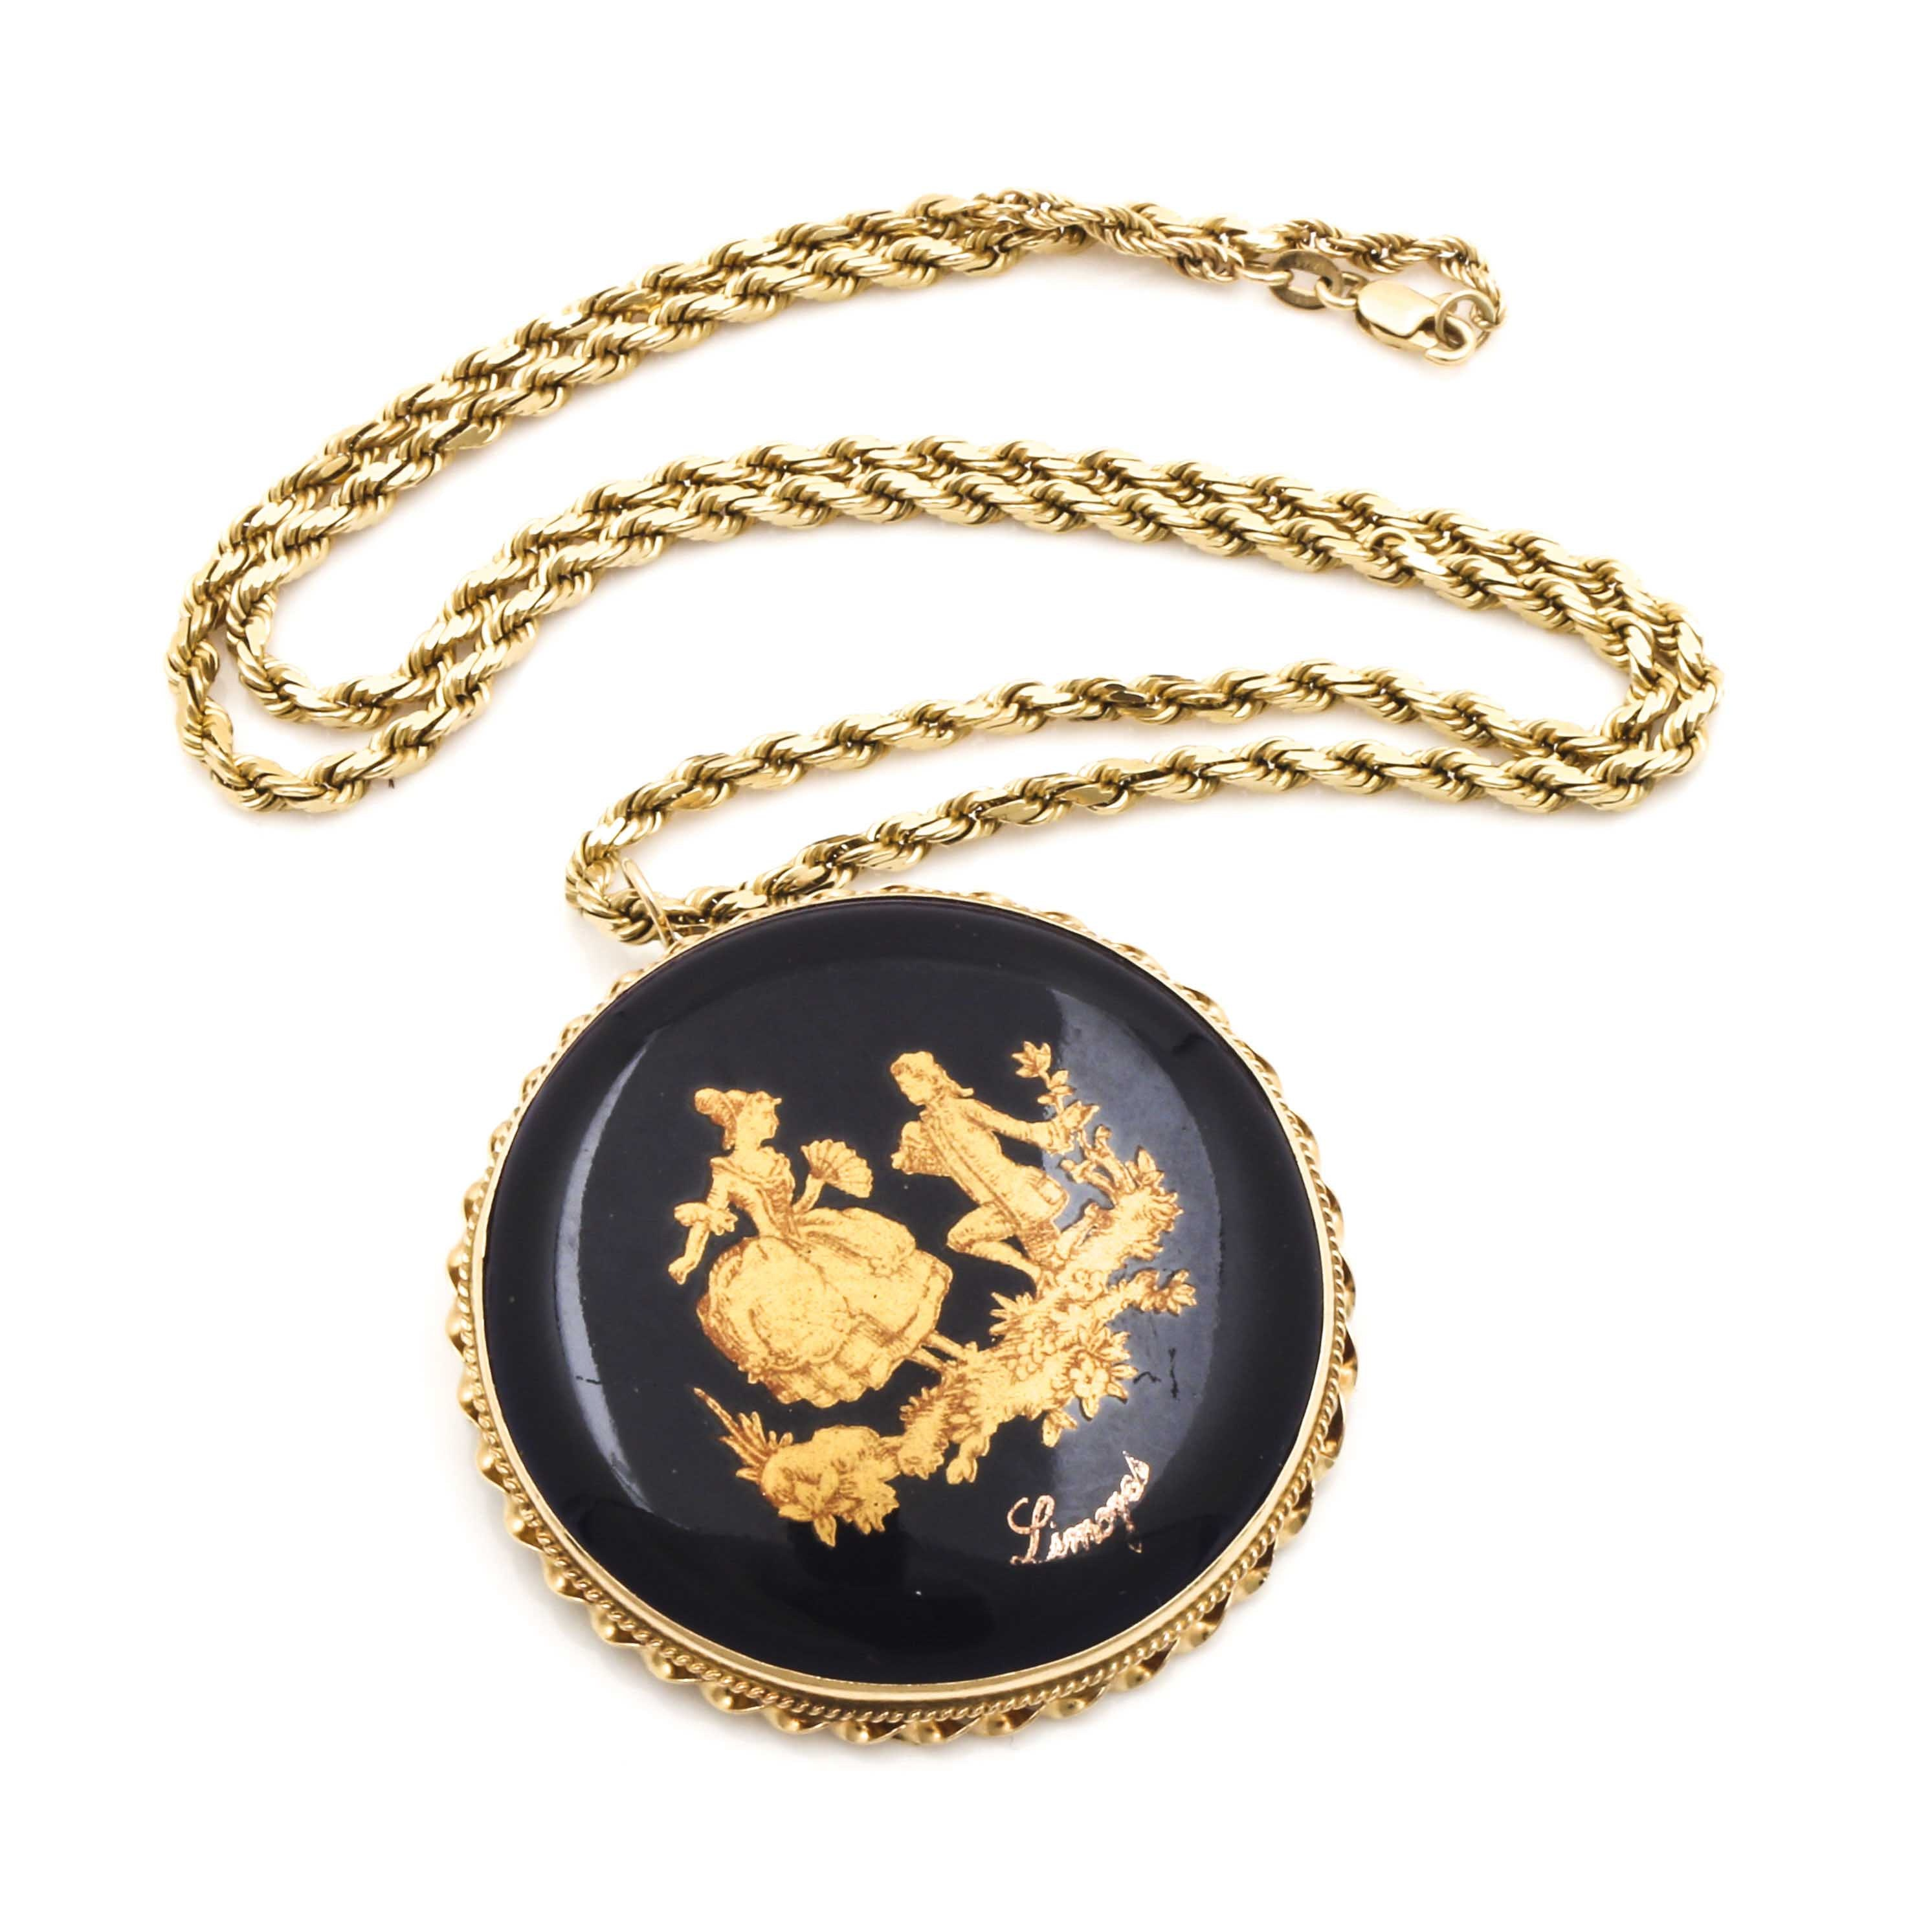 14K Yellow Gold Limoges Porcelain Pendant Necklace